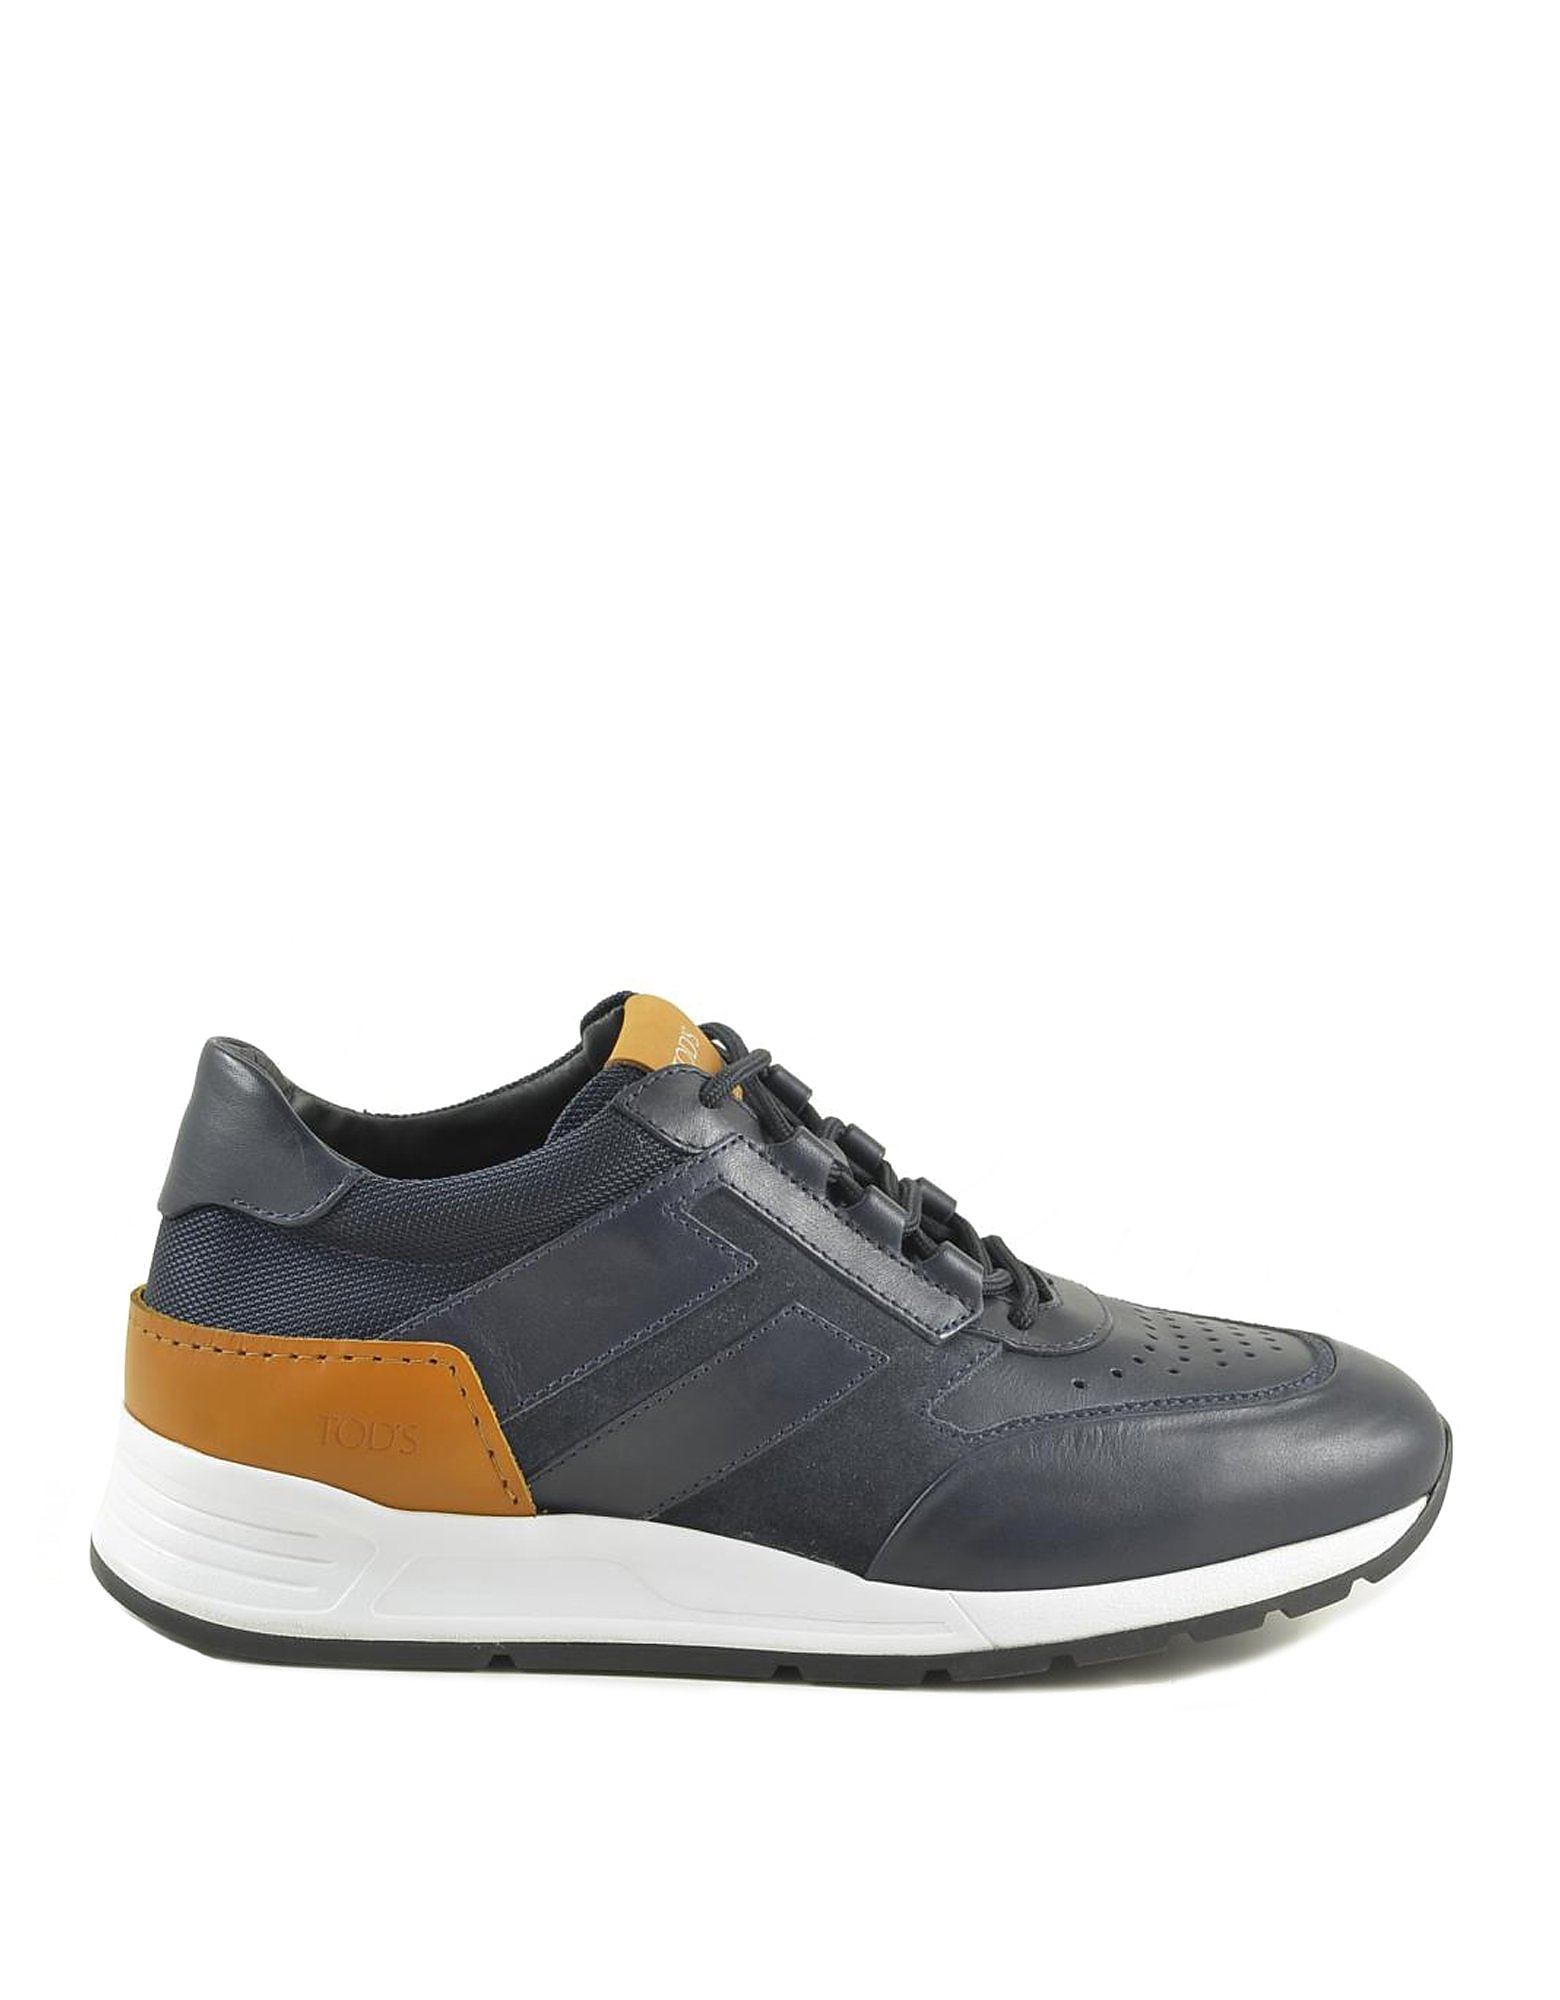 Tod's Designer Shoes, Men's Blue Sneakers